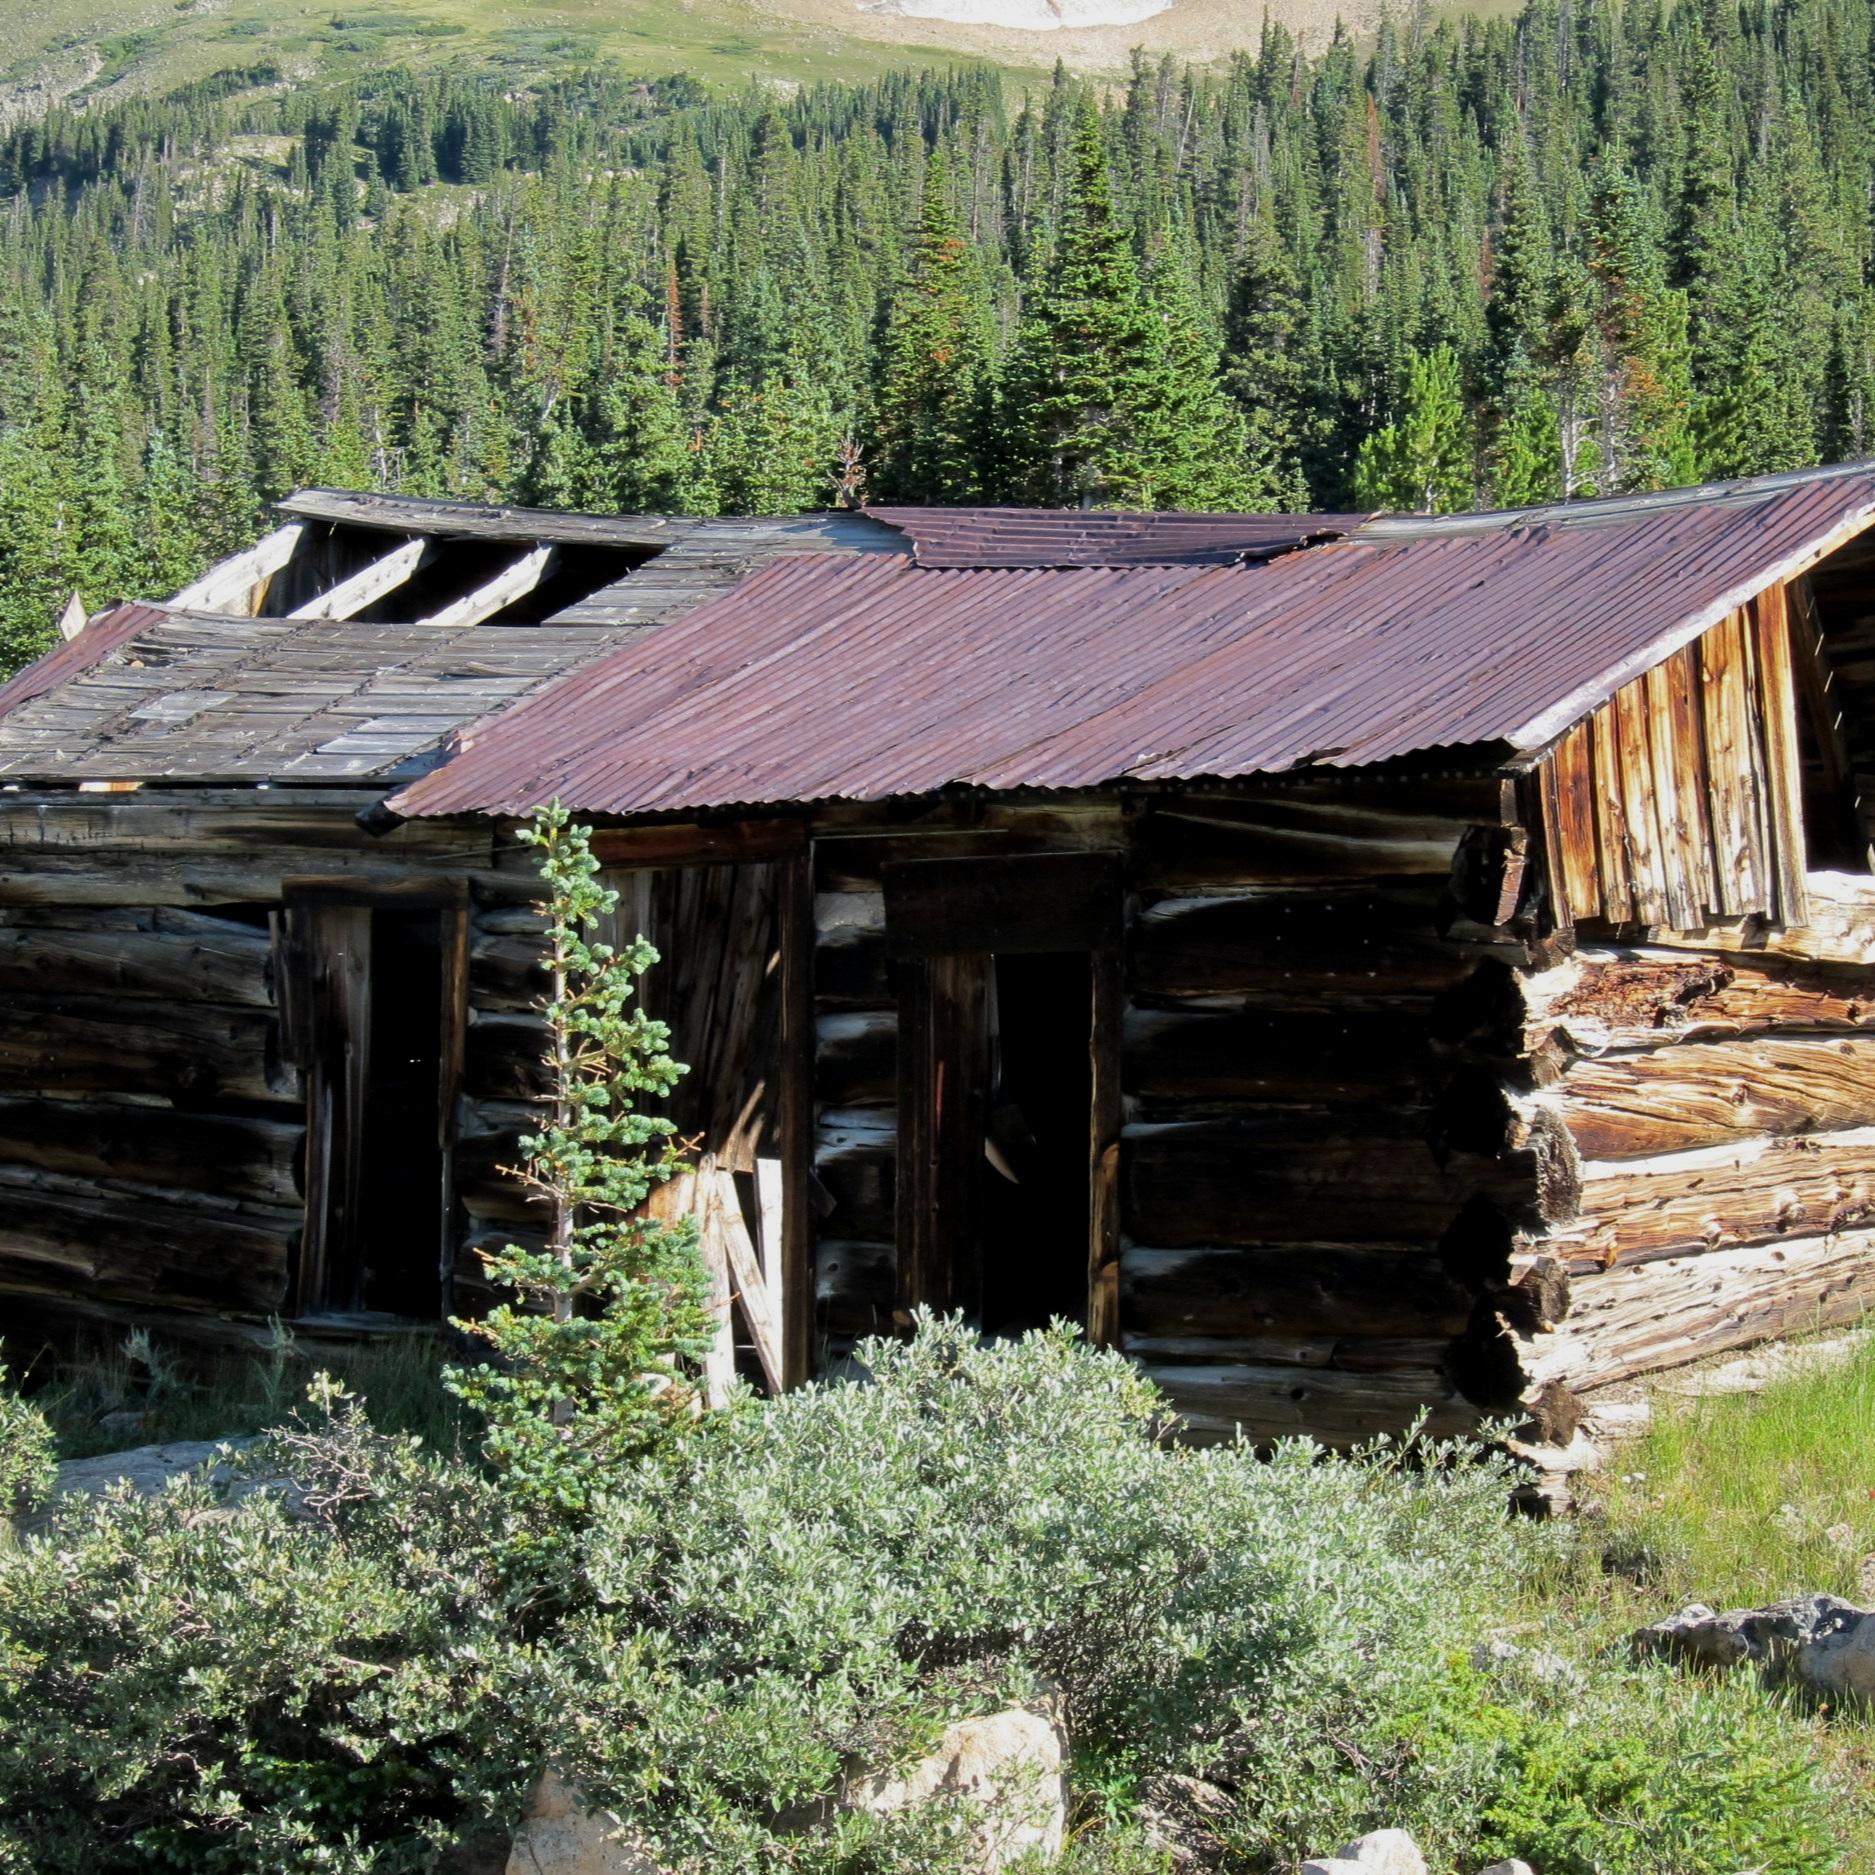 1980 - Year the Niwot Ridge LTER was established